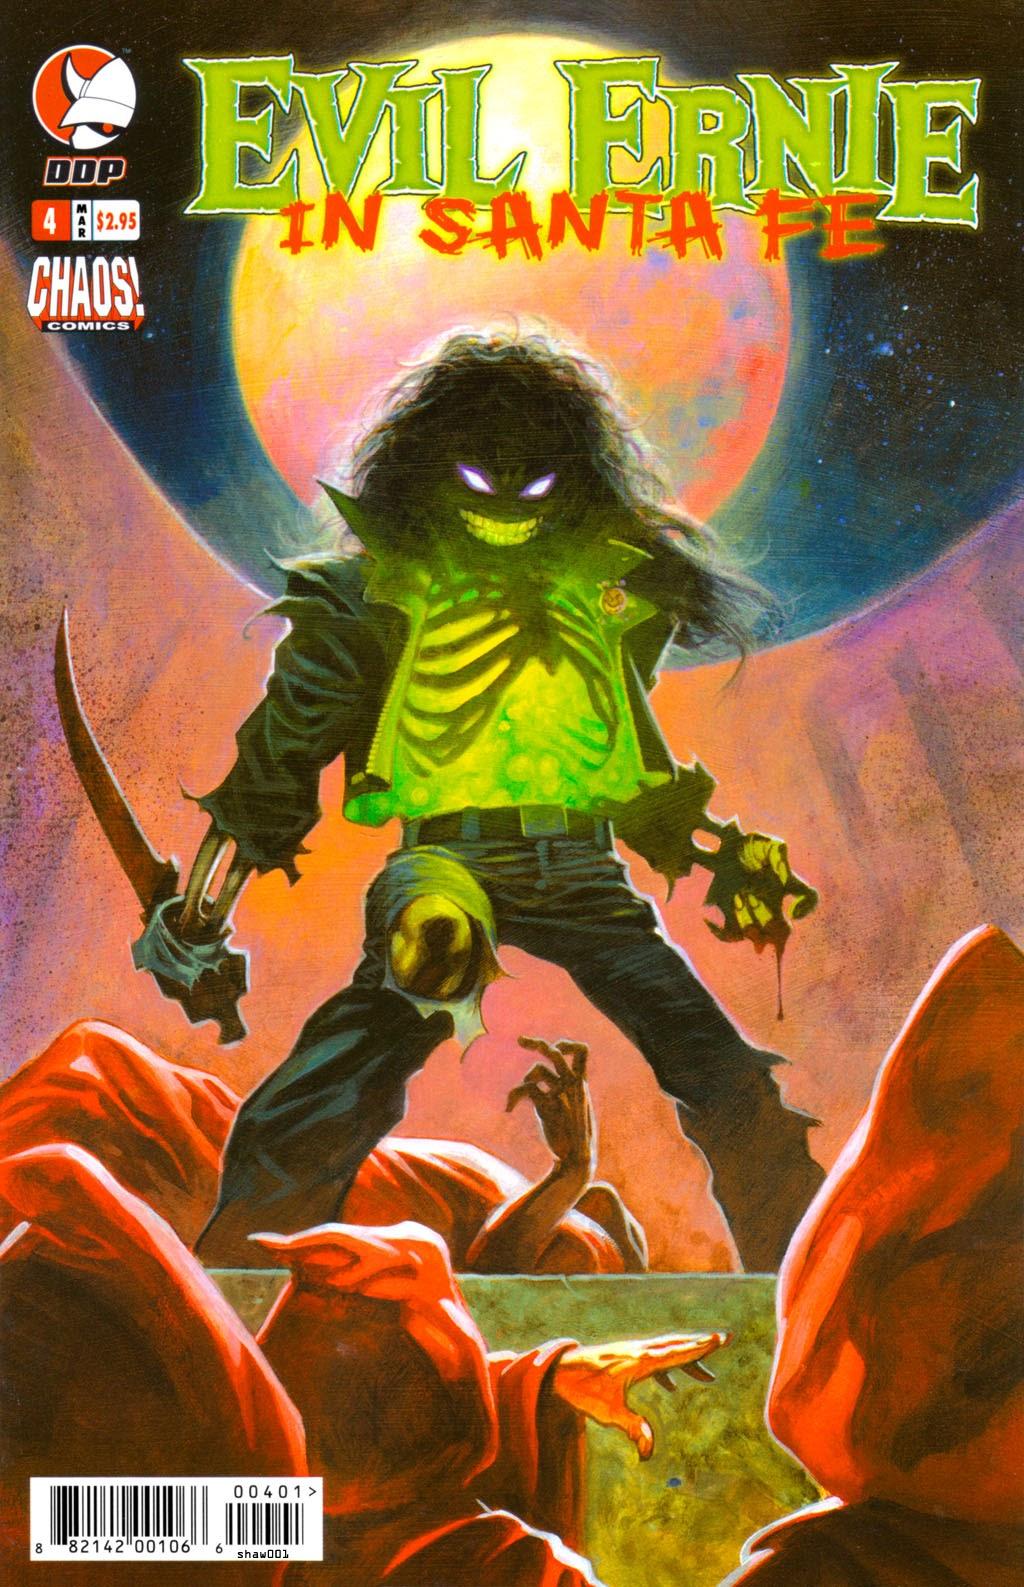 Read online Evil Ernie in Santa Fe comic -  Issue #4 - 1